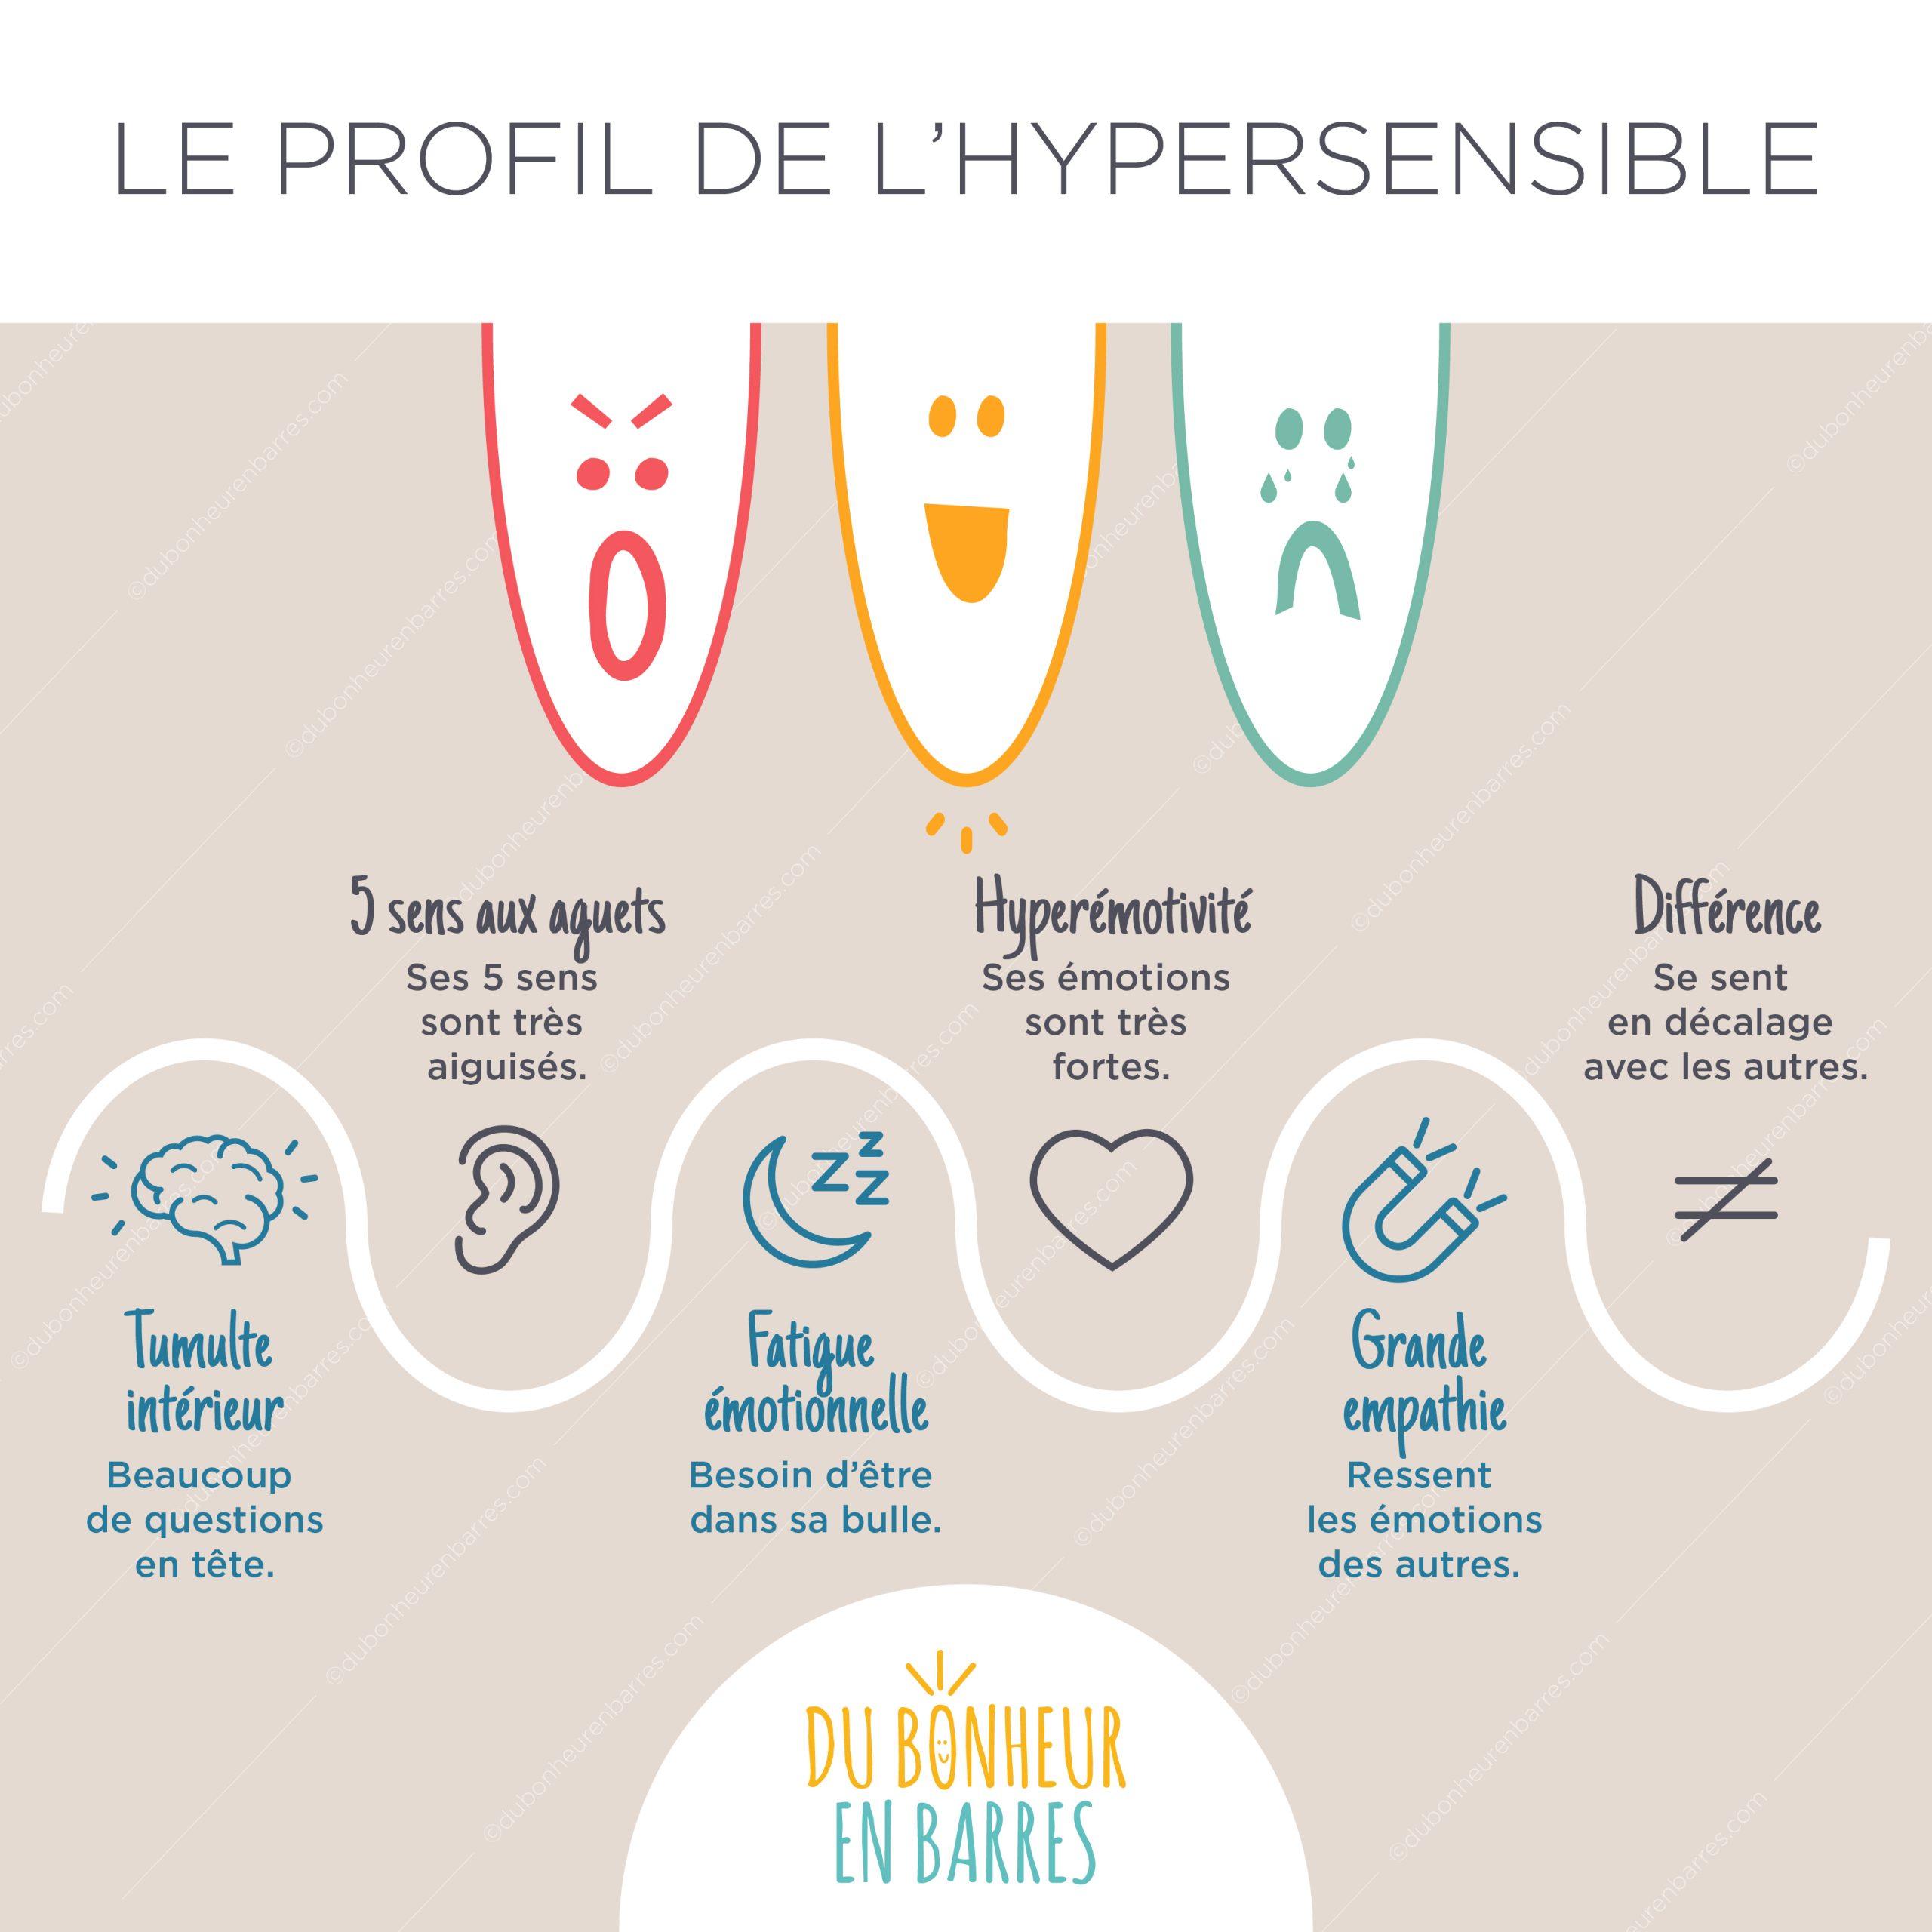 Profil de l'hypersensible